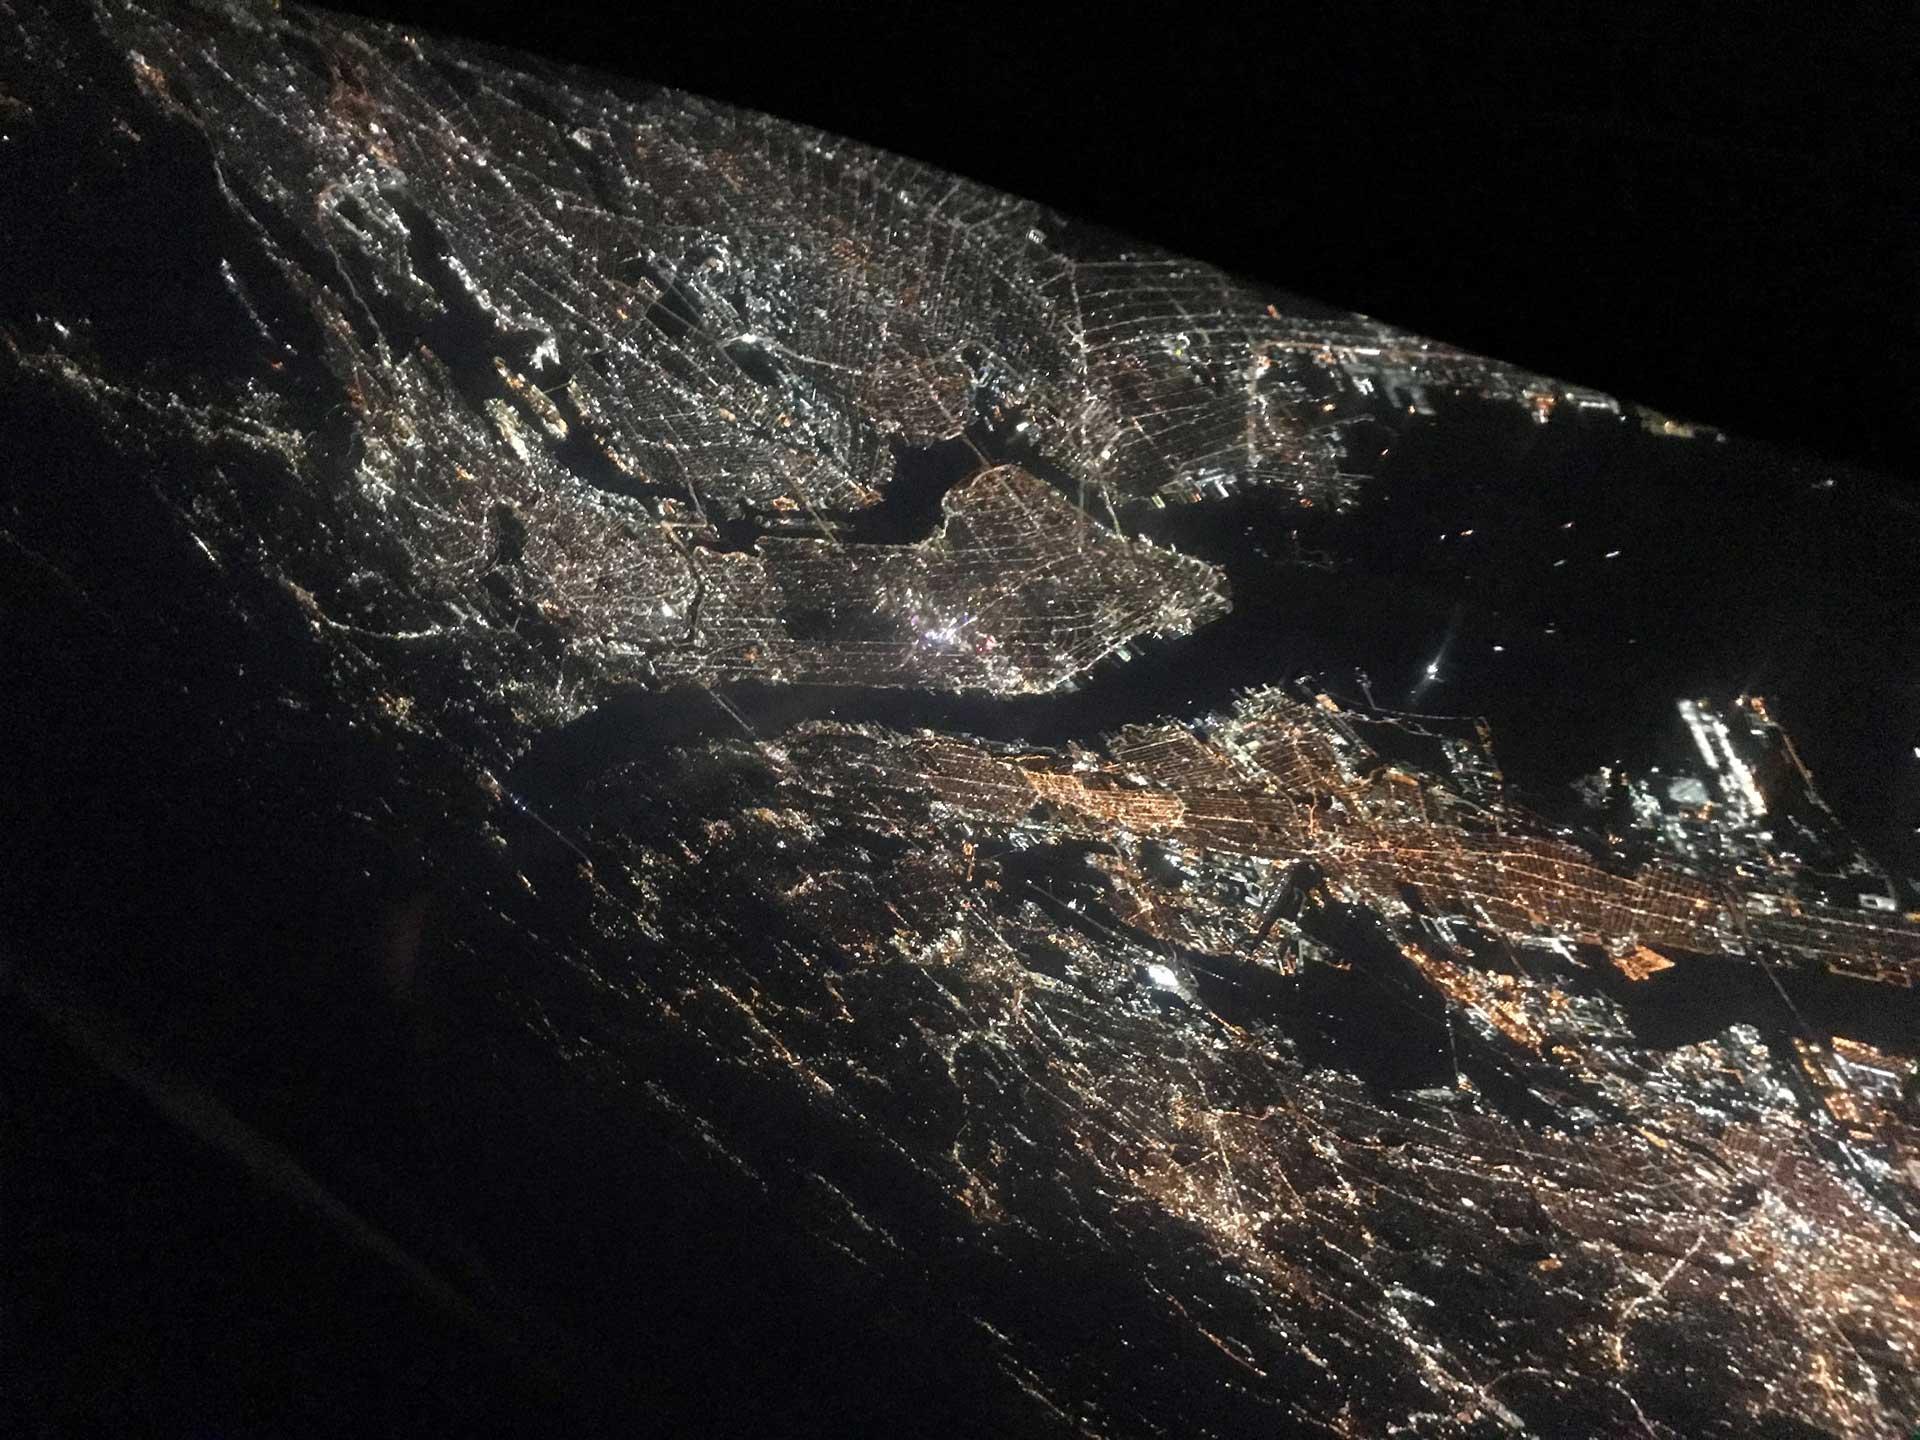 Cyril-Destremau-NYC-New-York-at-night